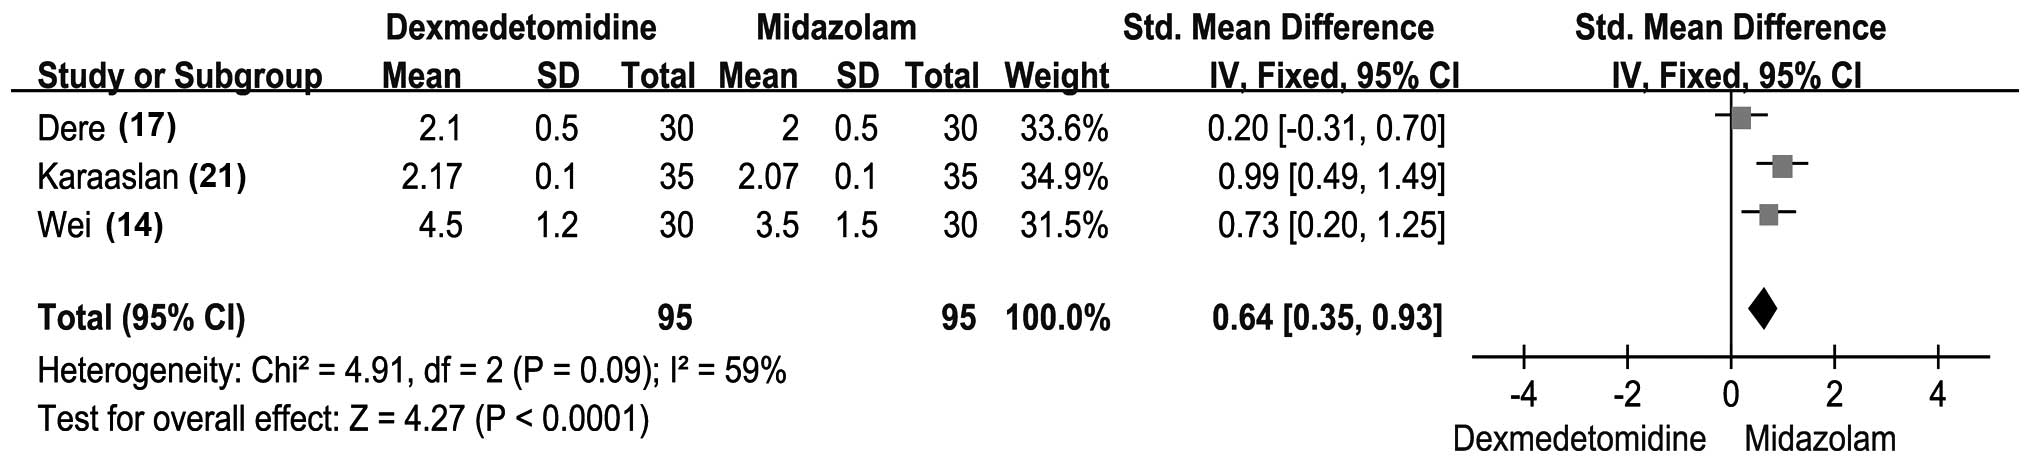 Dexmedetomidine versus midazolam for sedation during